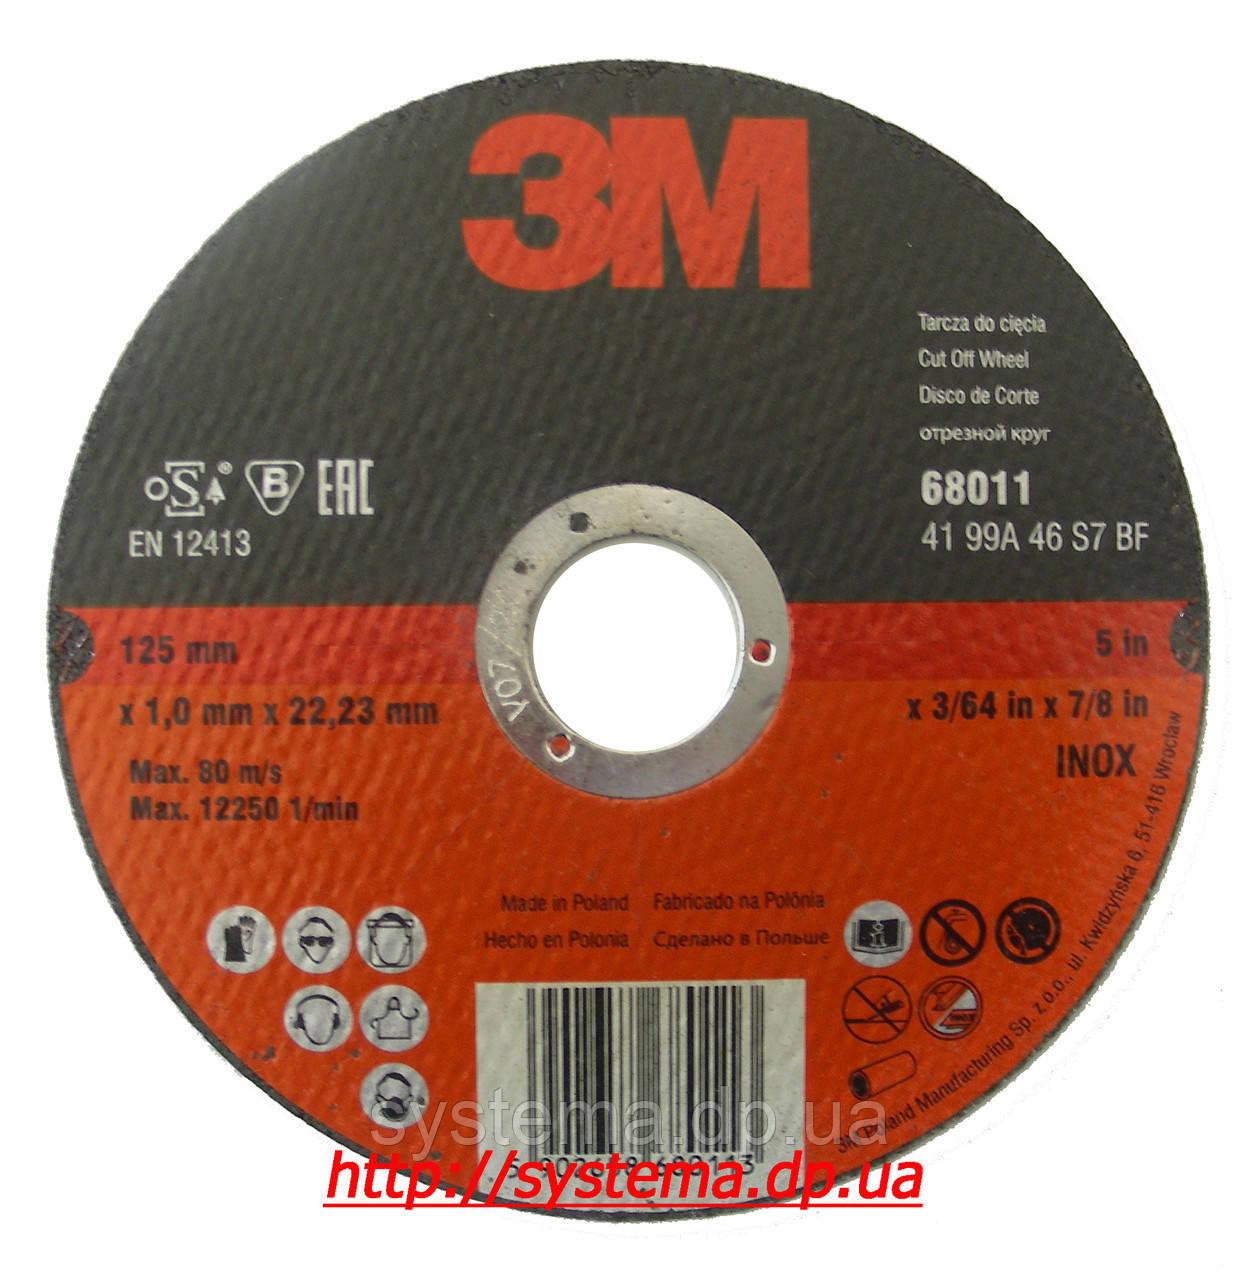 3M 62919 - Отрезной круг для нерж., прямой, INOX, 180х22,23х2,5 мм